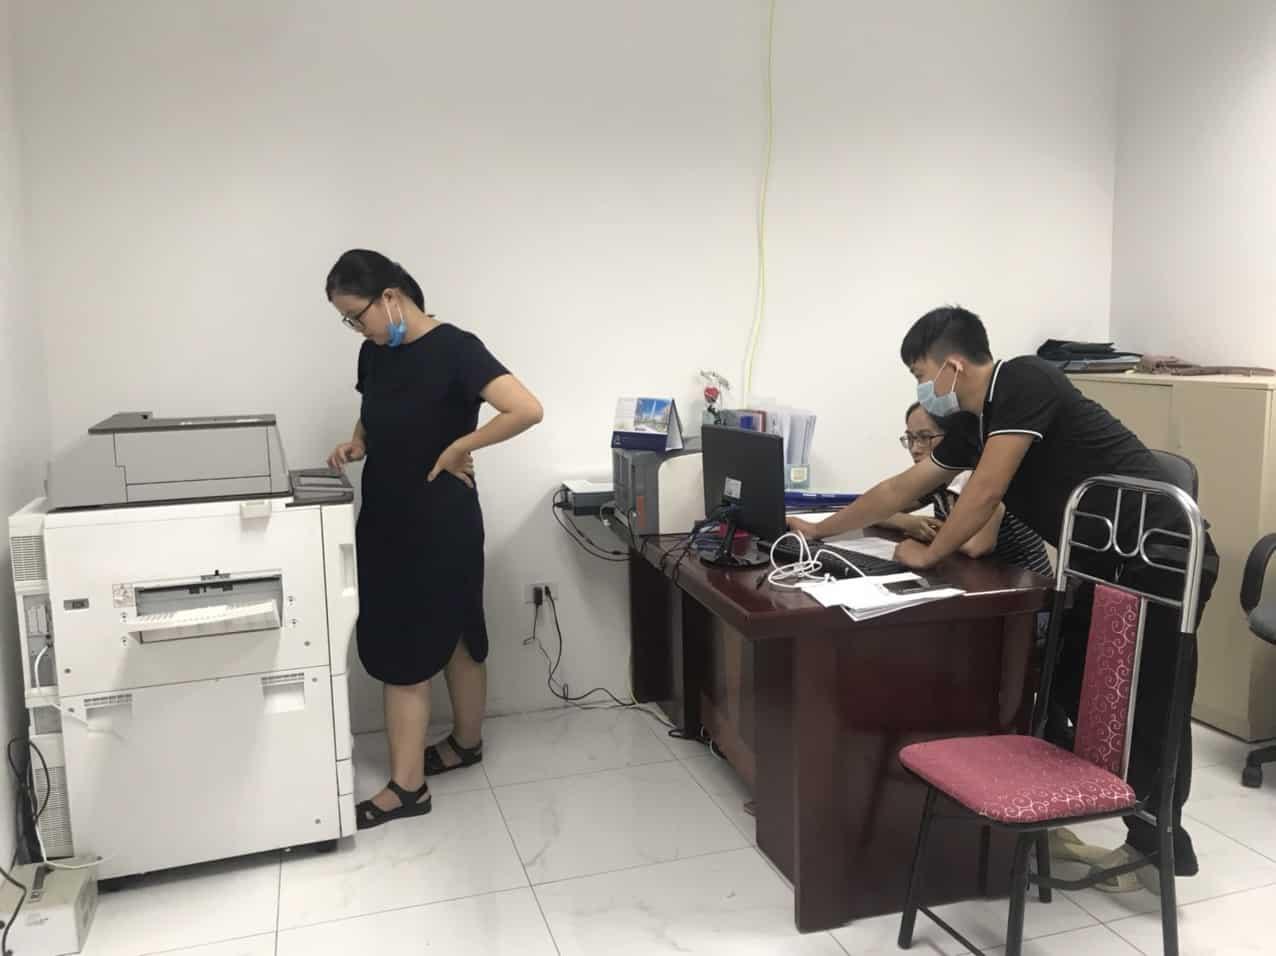 bán máy photocopy tại Uông Bí